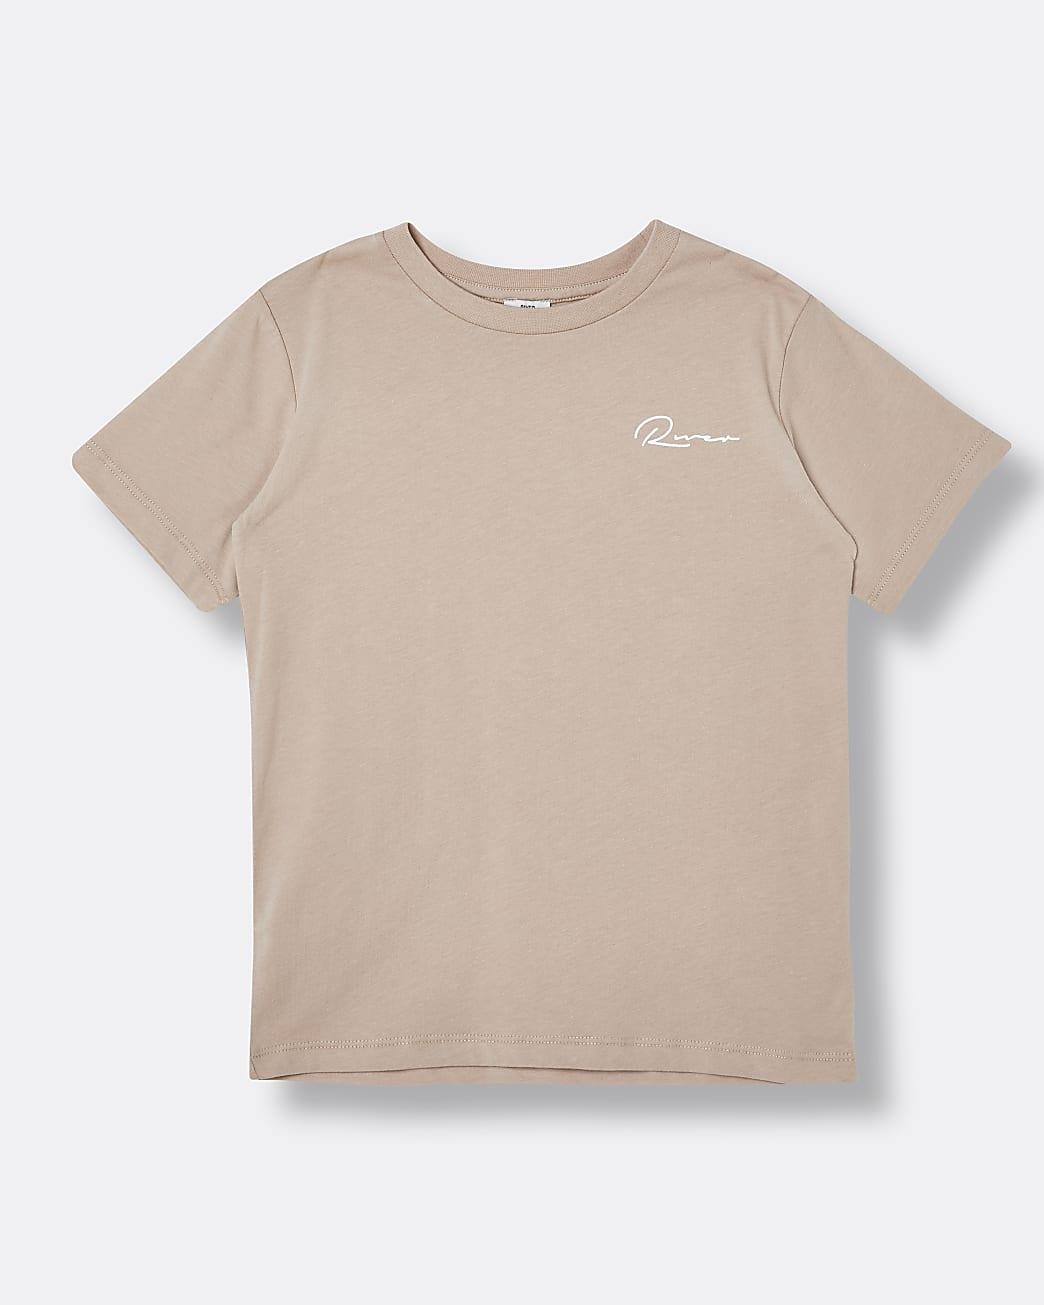 Boys stone River t-shirt